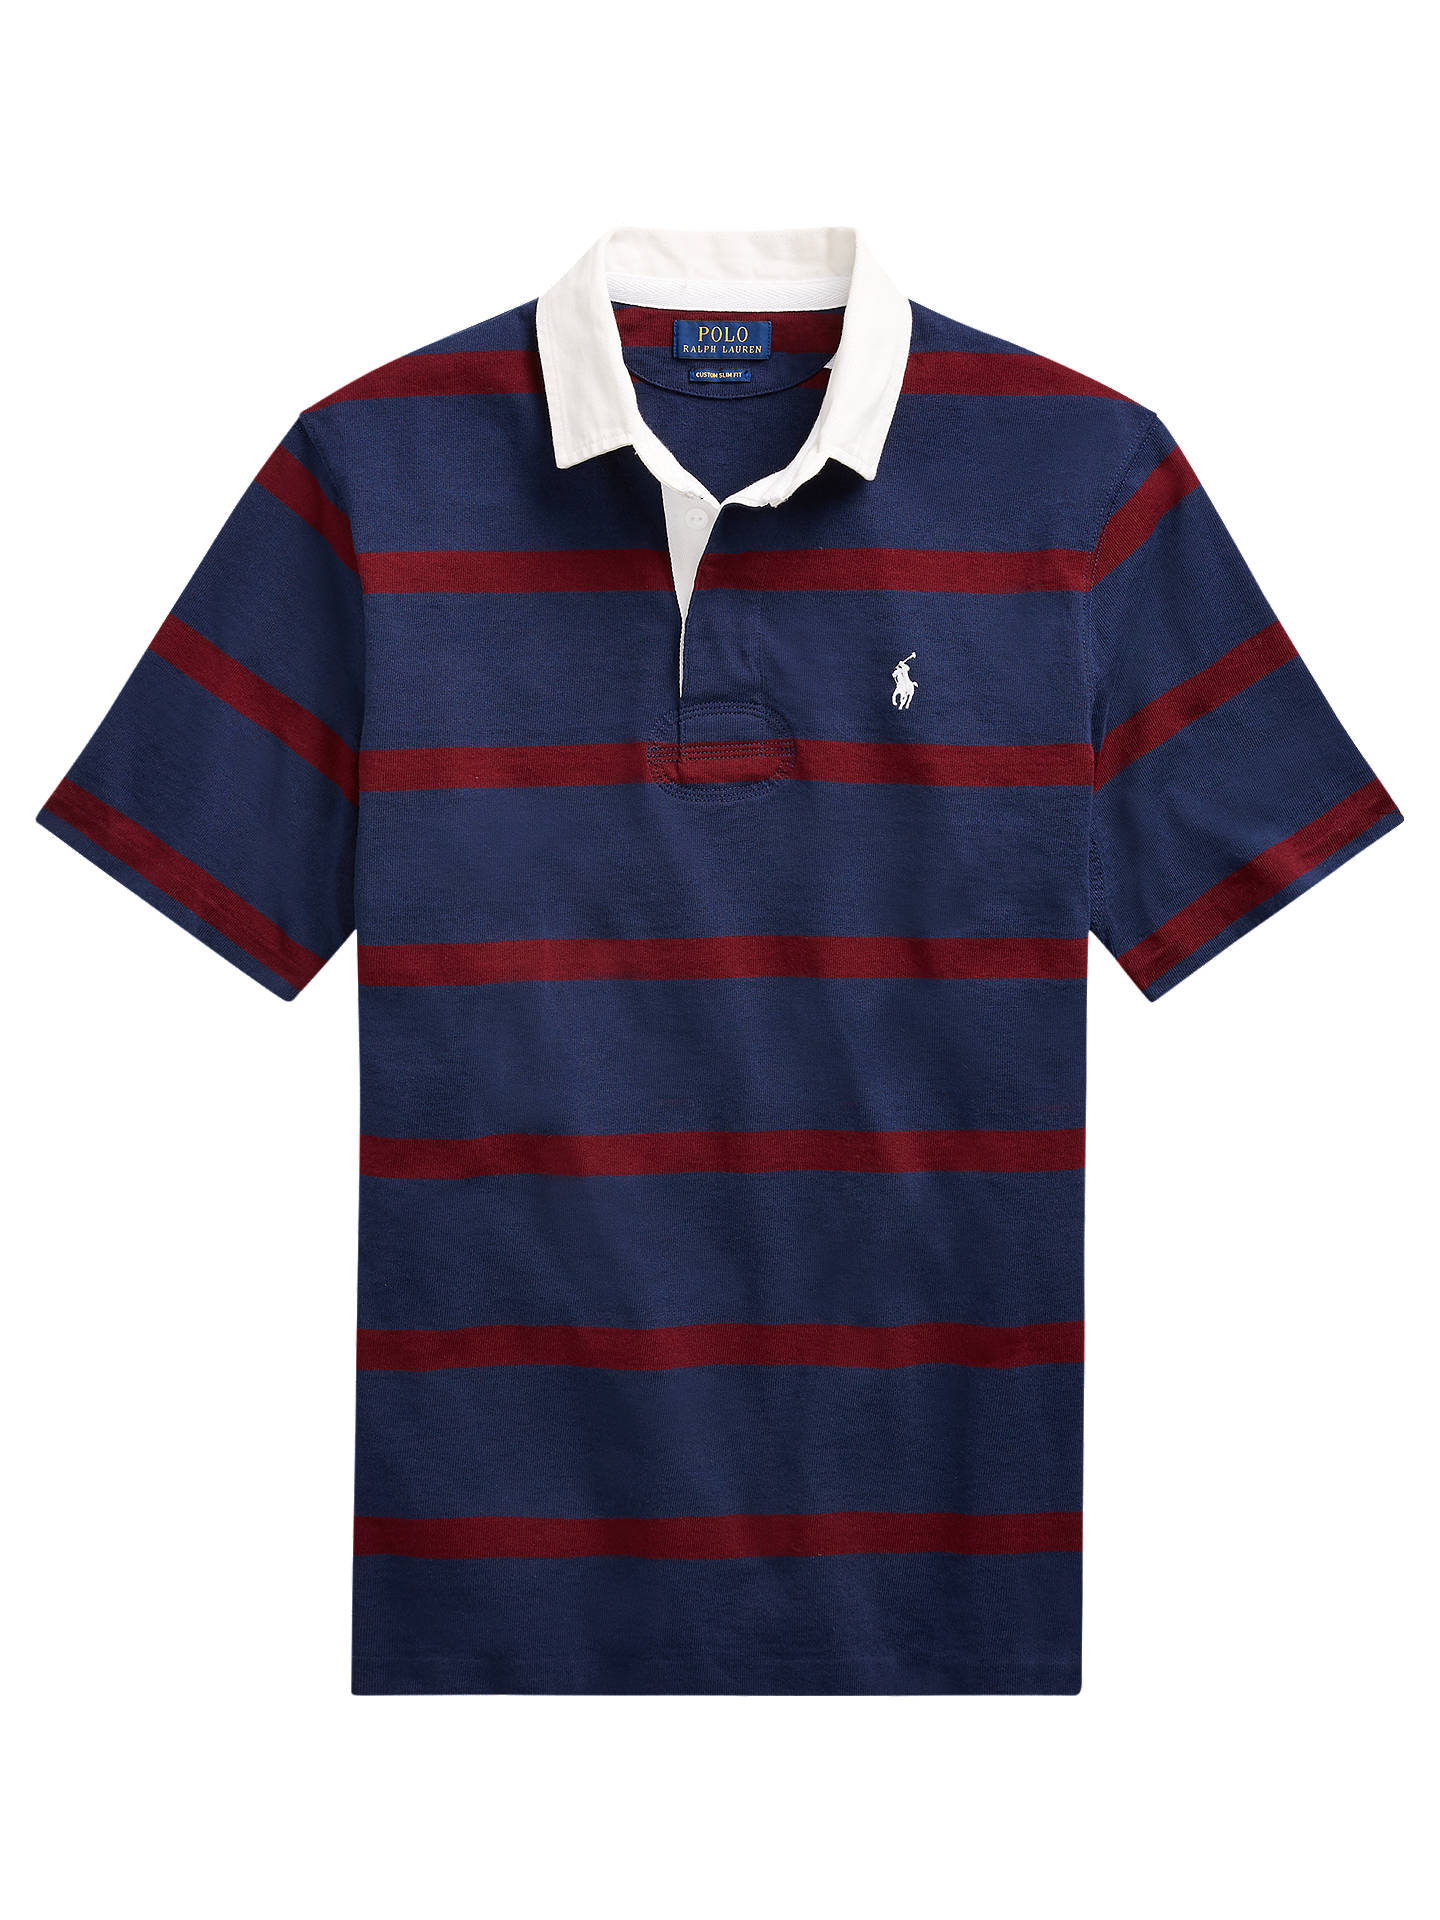 d2b7ab97ff0 ... wholesale buypolo ralph lauren short sleeve stripe rugby shirt newport  navy wine m online cb9de 9a7cb